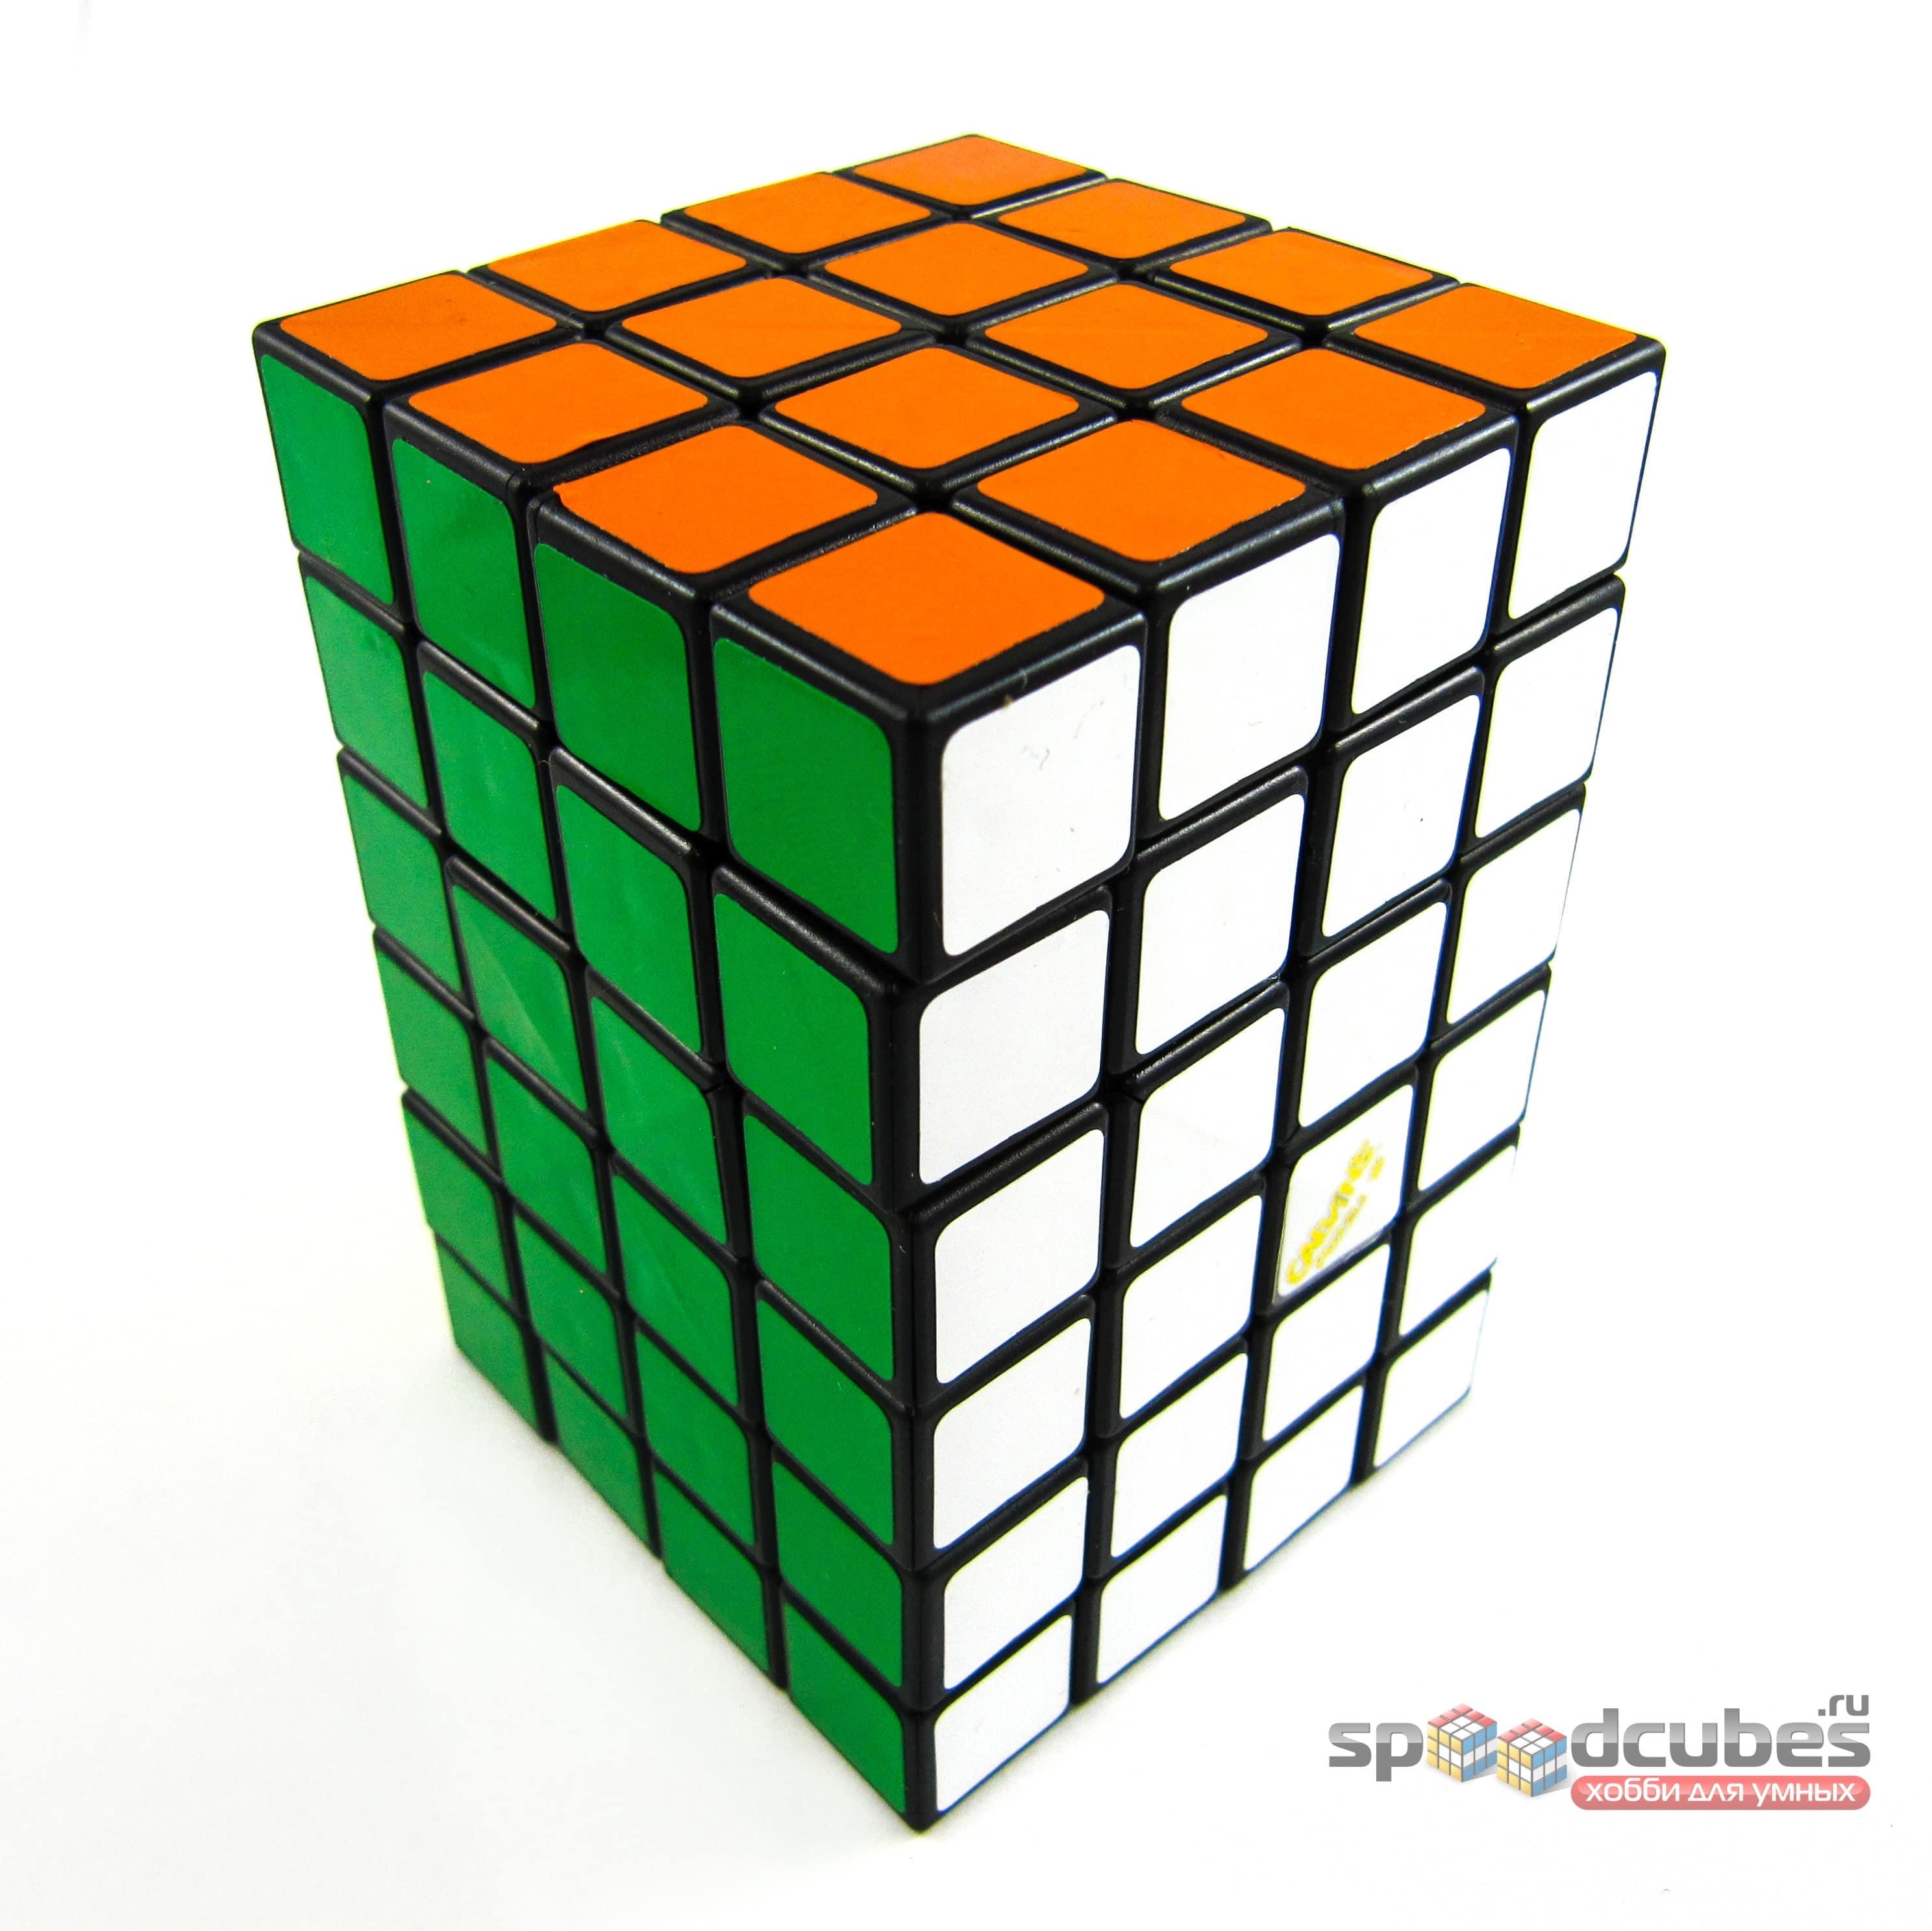 Calvin's 4x4x6 1